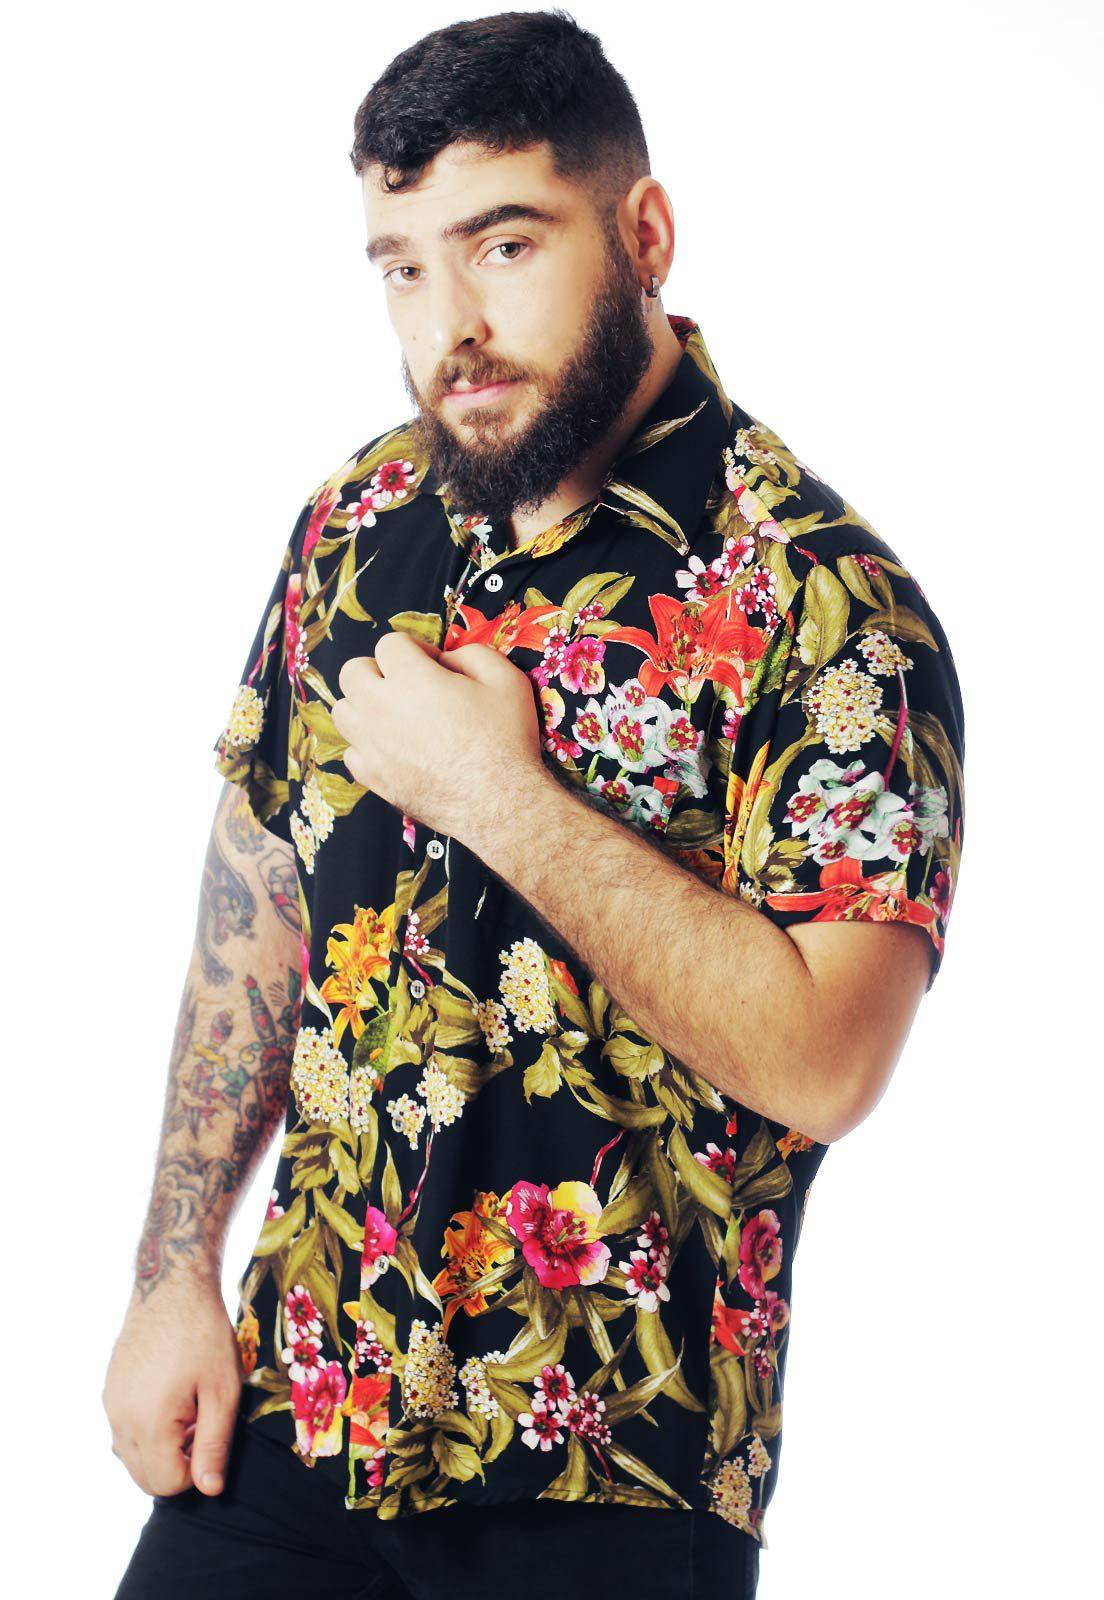 Camisa Floral Estampada ElephunK West N' Black Preta